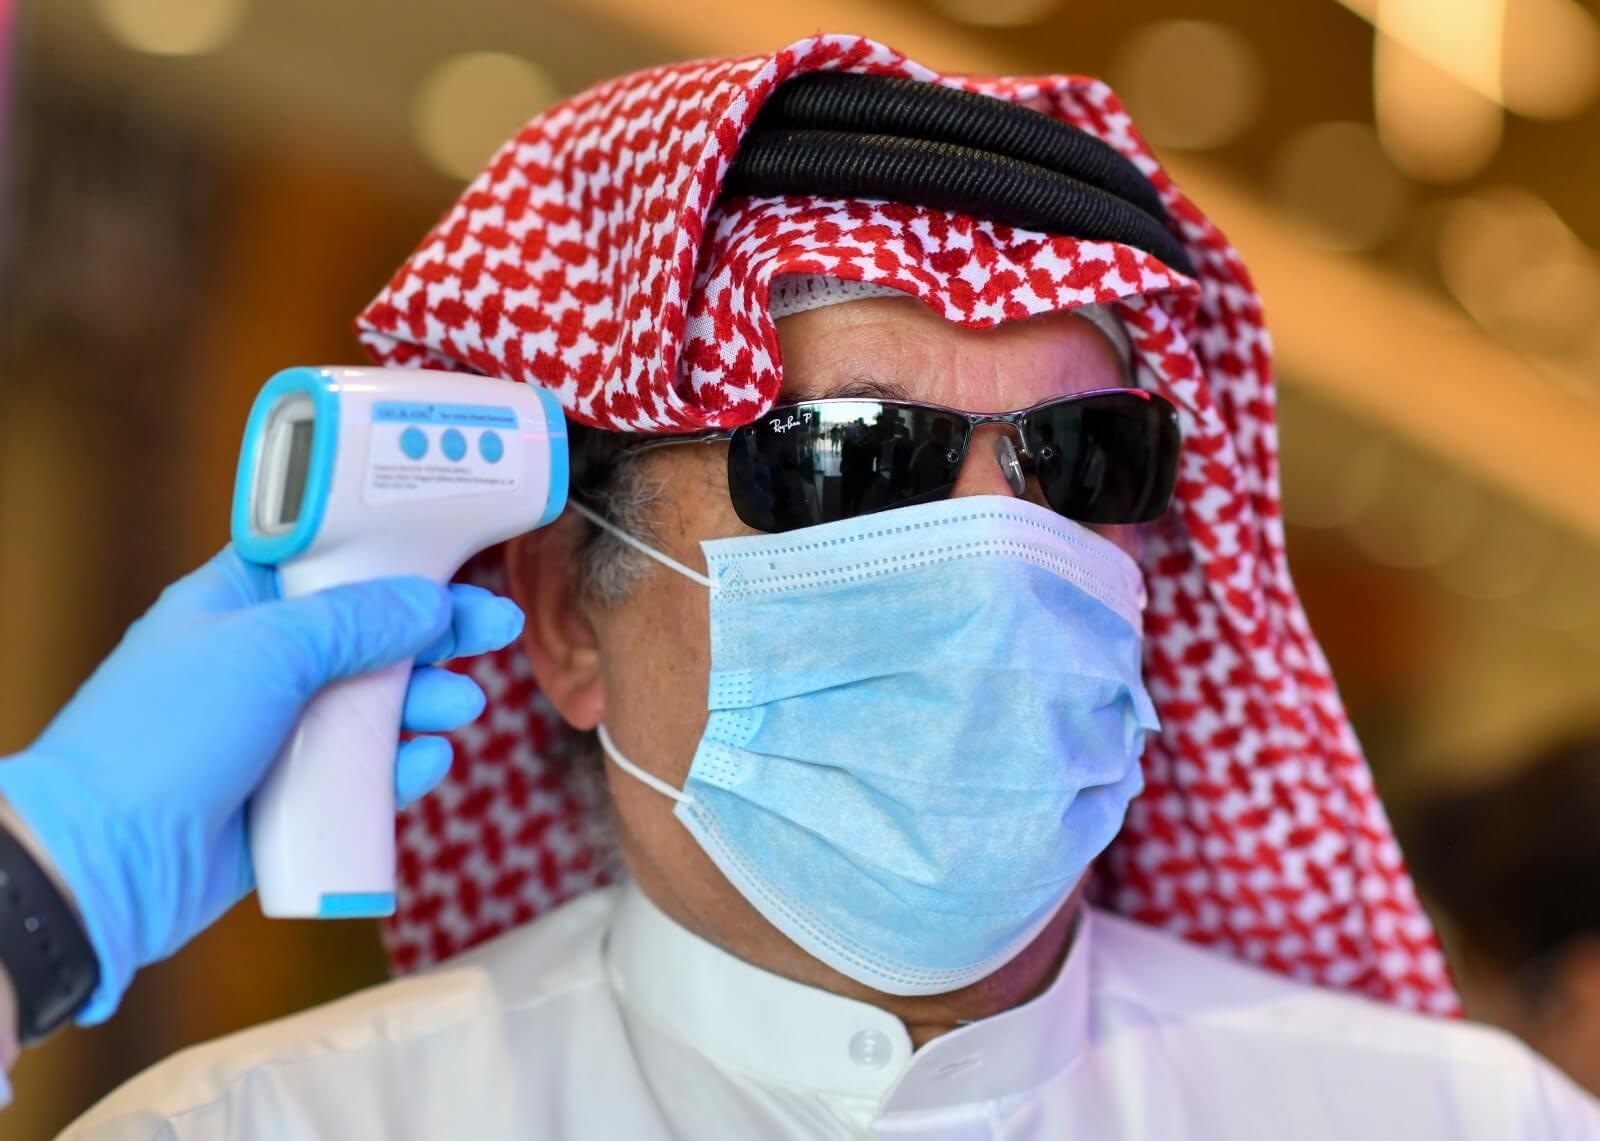 Katar fot. EPA/NOUSHAD THEKKAYIL